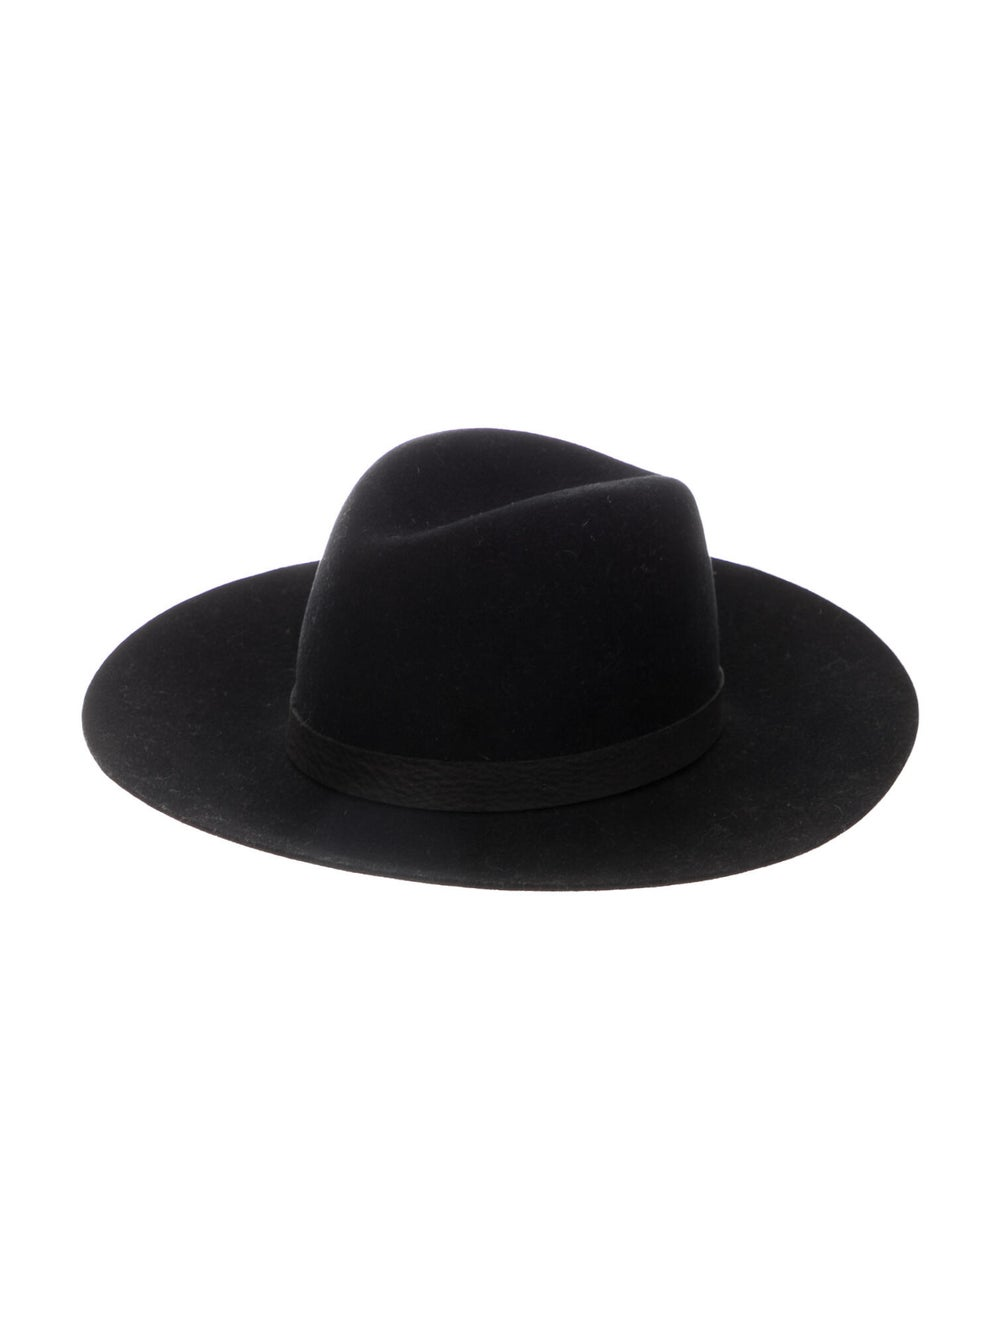 Janessa Leone Wool Fedora Hat Black - image 1